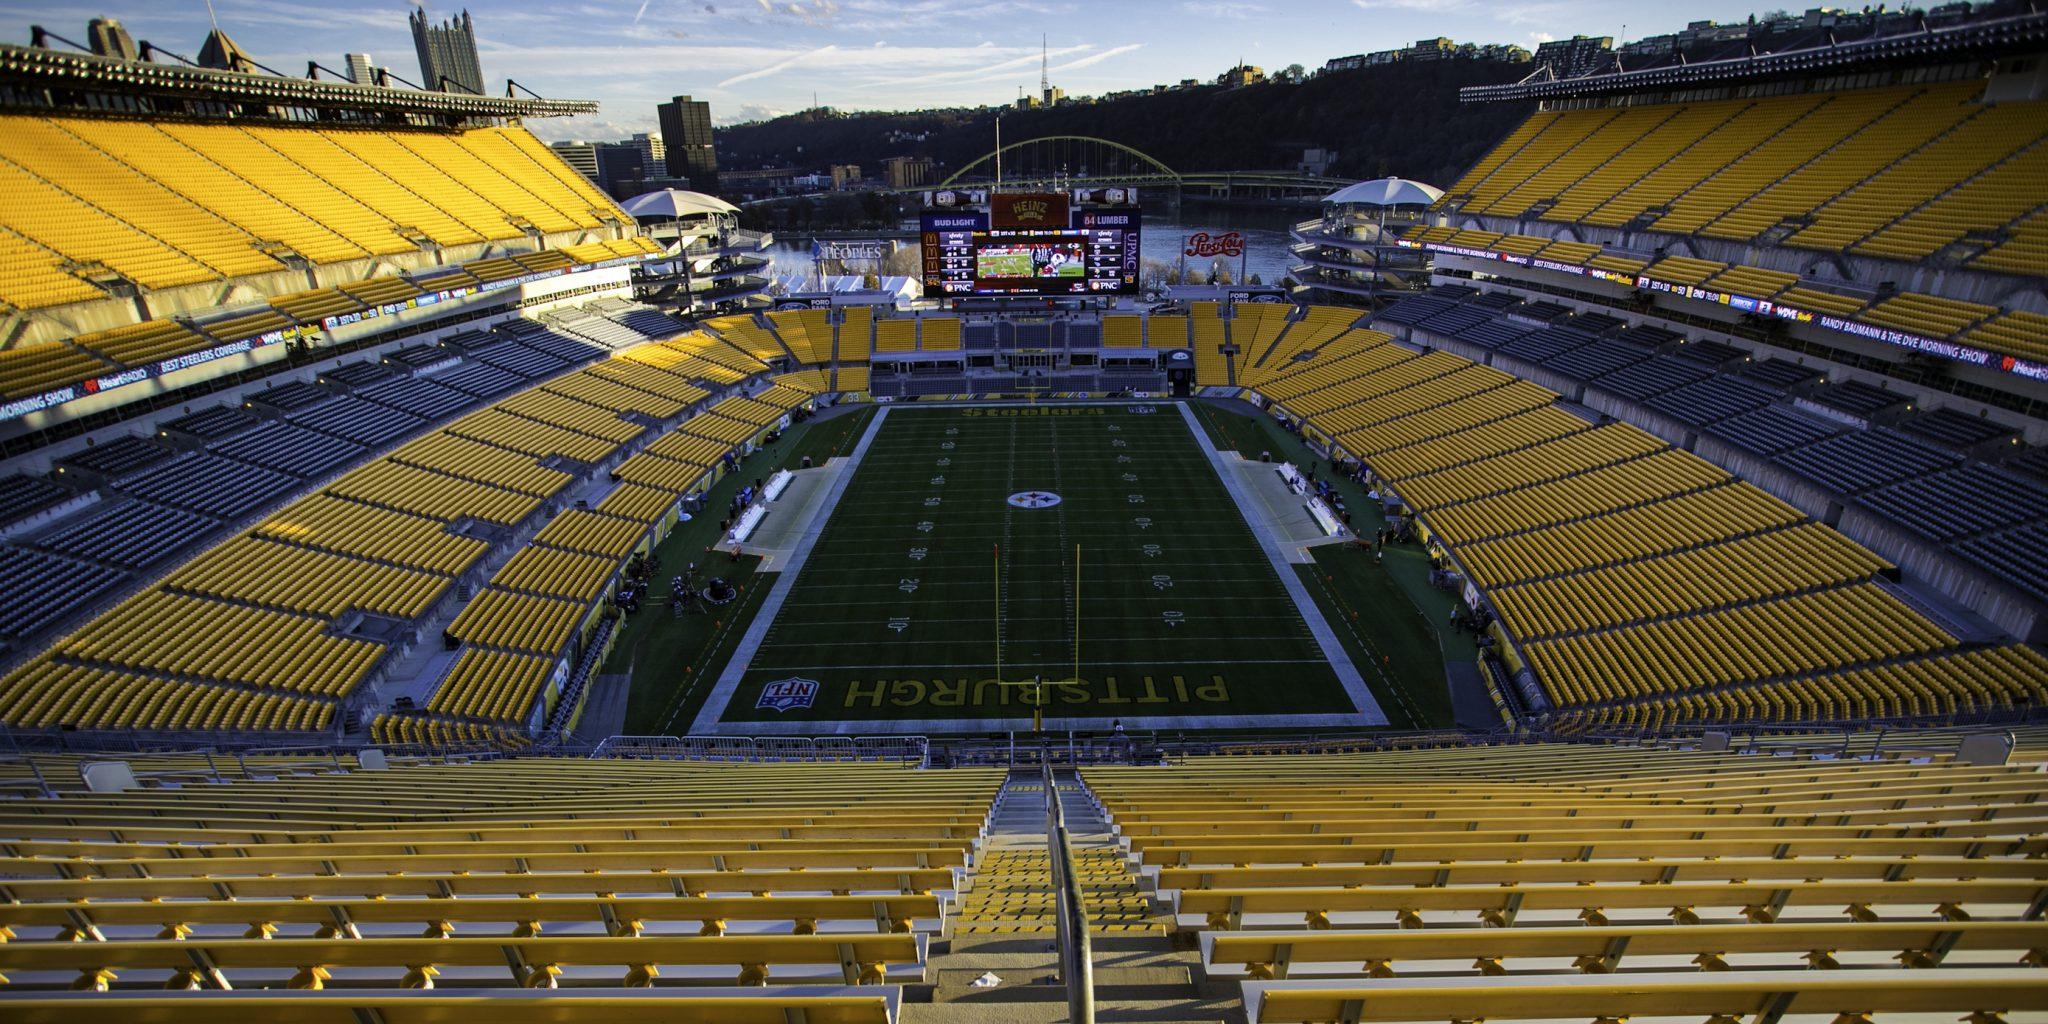 Steelers Add Simon to Facilities Team